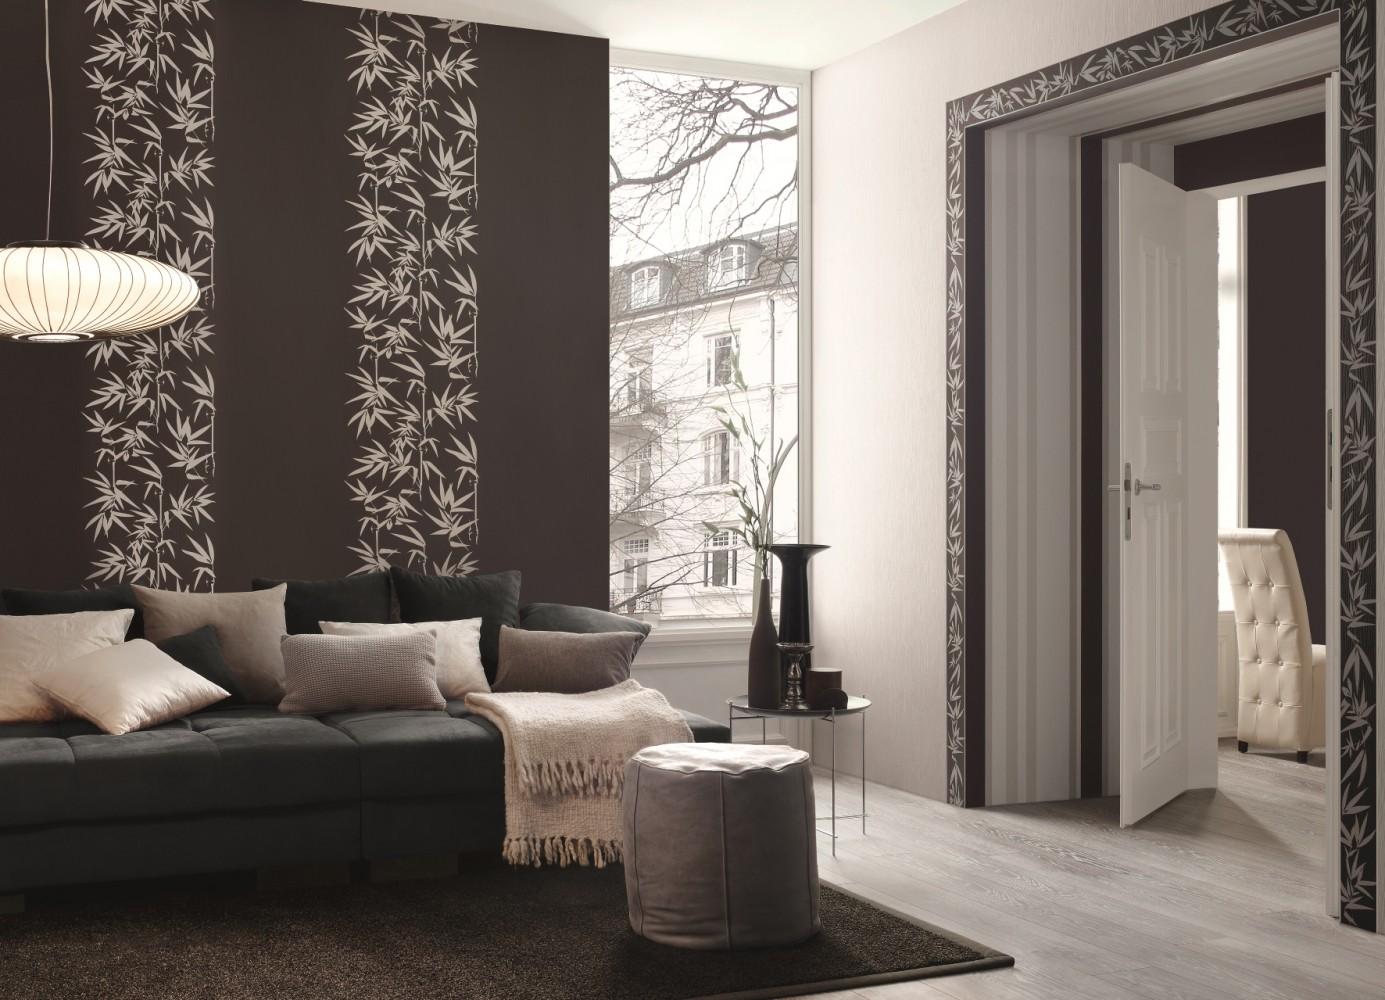 Jette Joop Tapete Streifen : Woven Bamboo Wallpaper